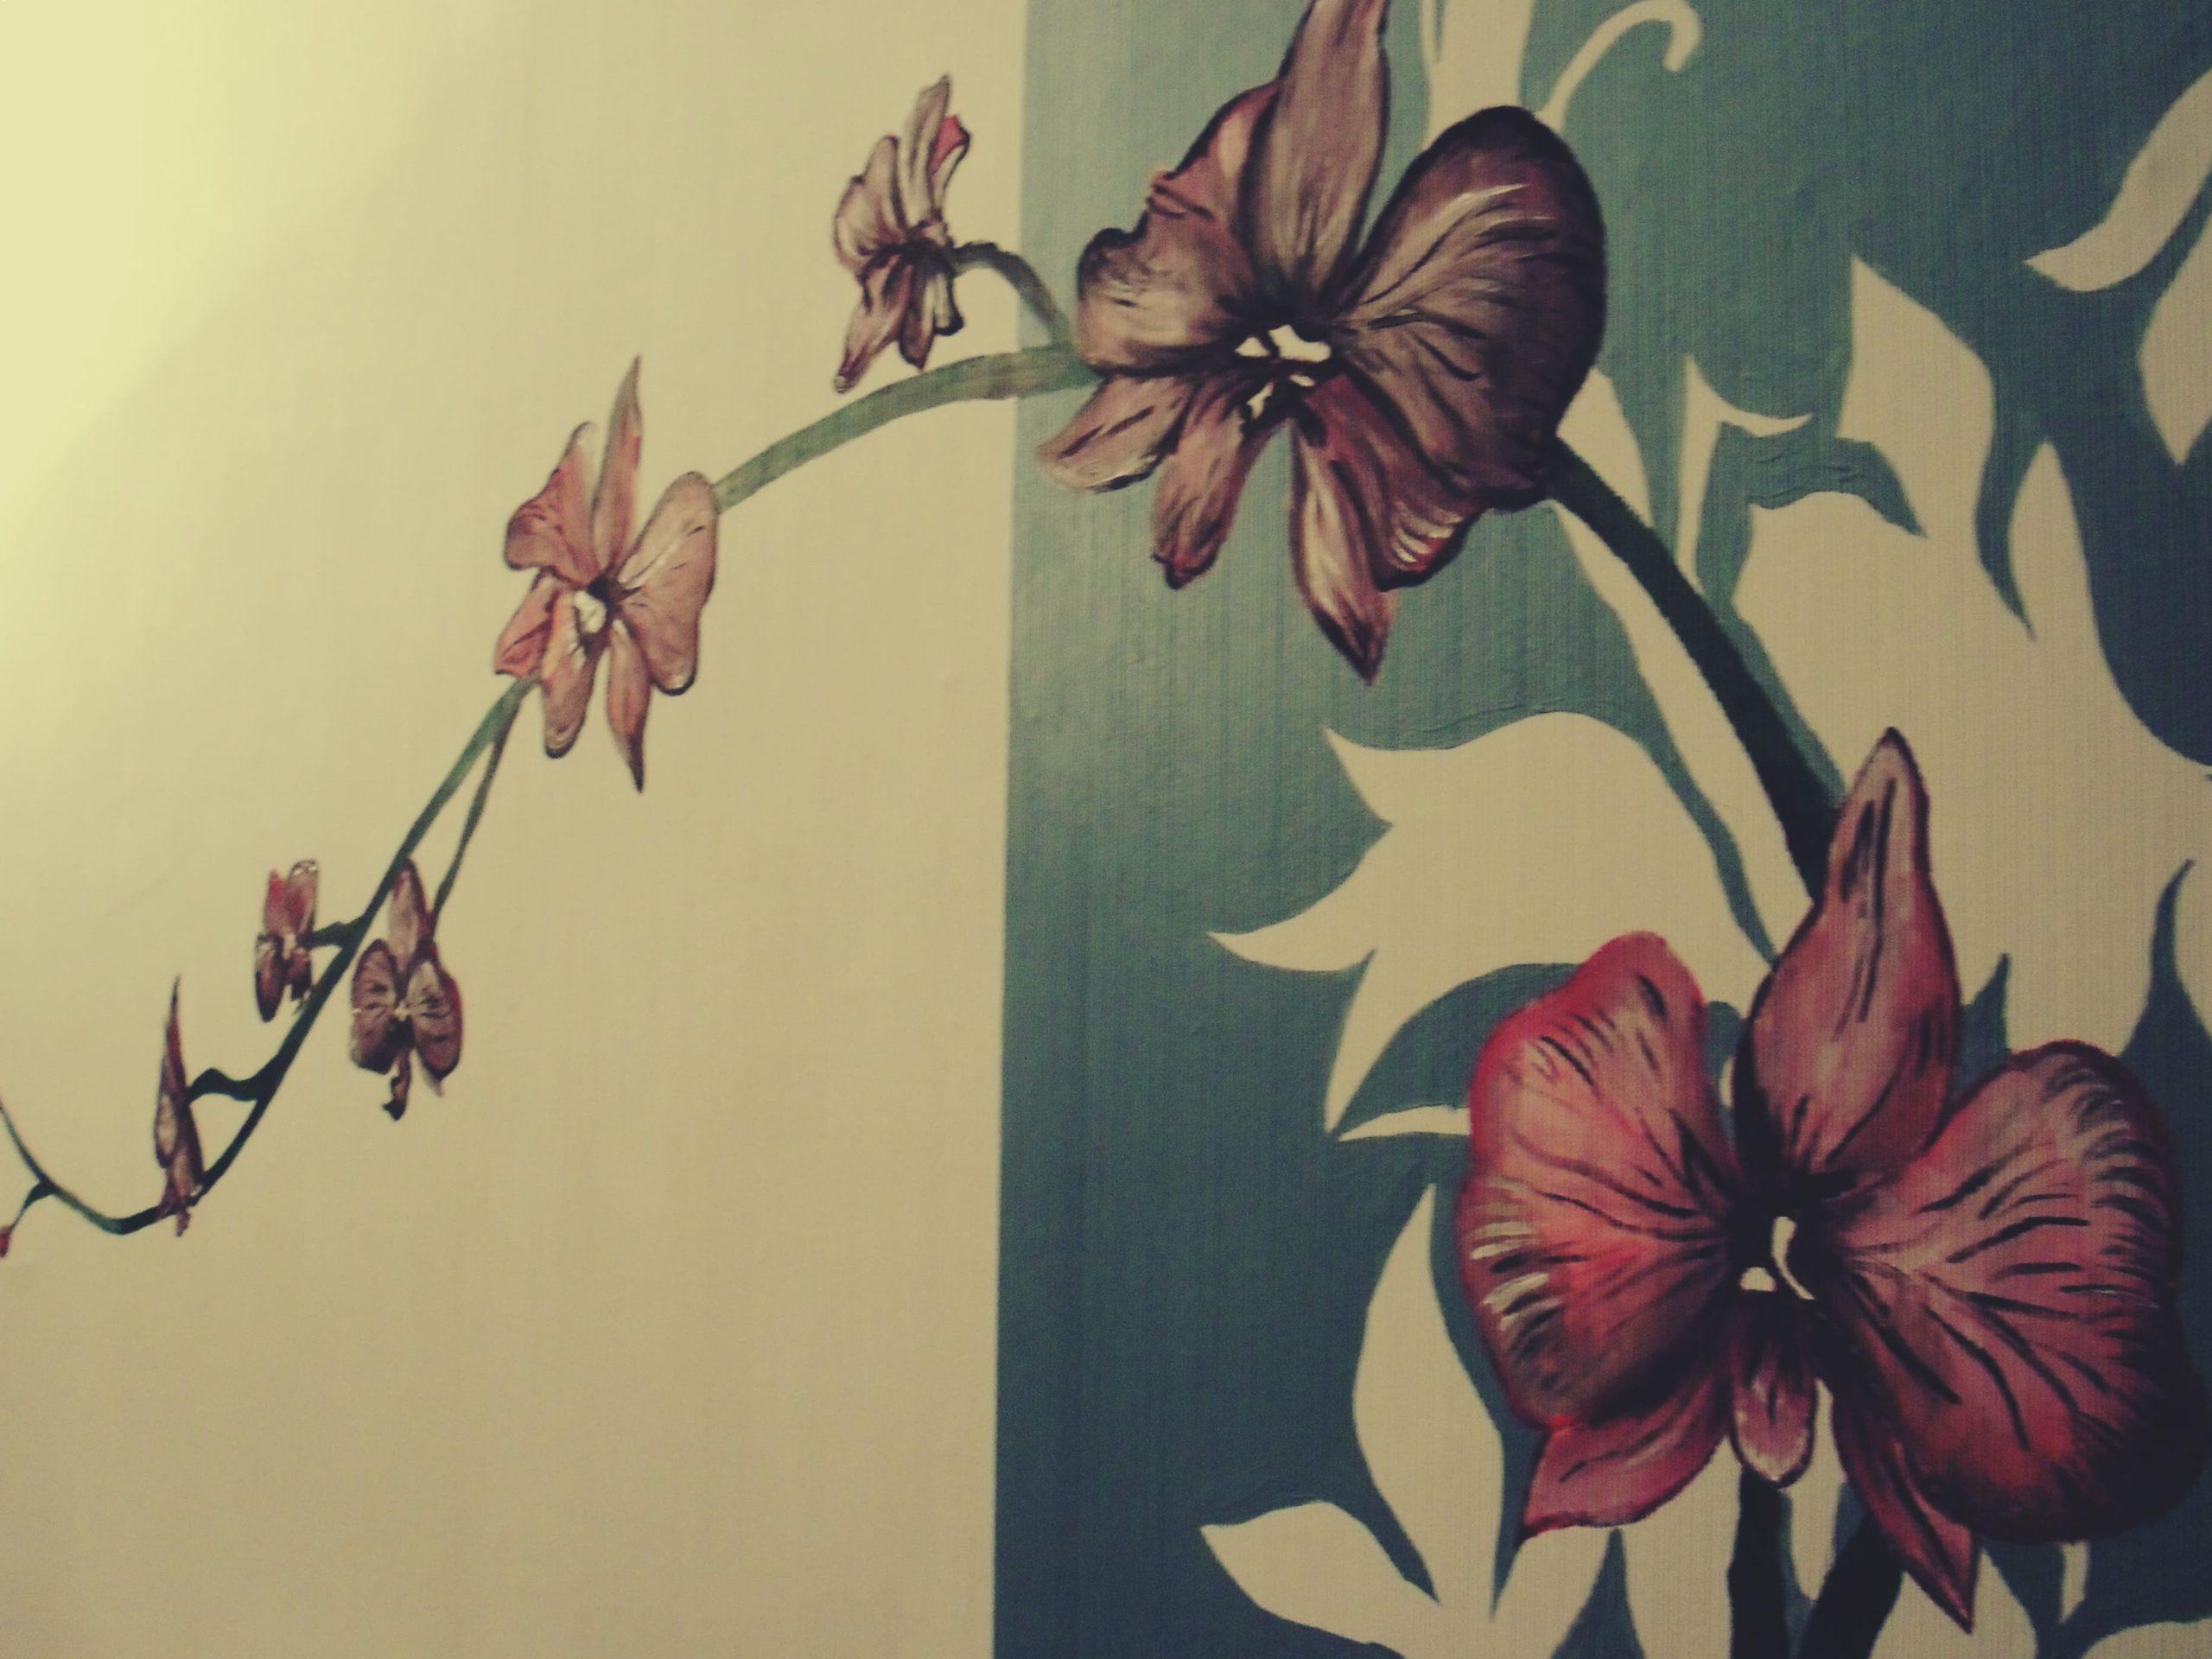 menine-kuryba-sienu-dekoravimas-ivairus-interjerai (40)